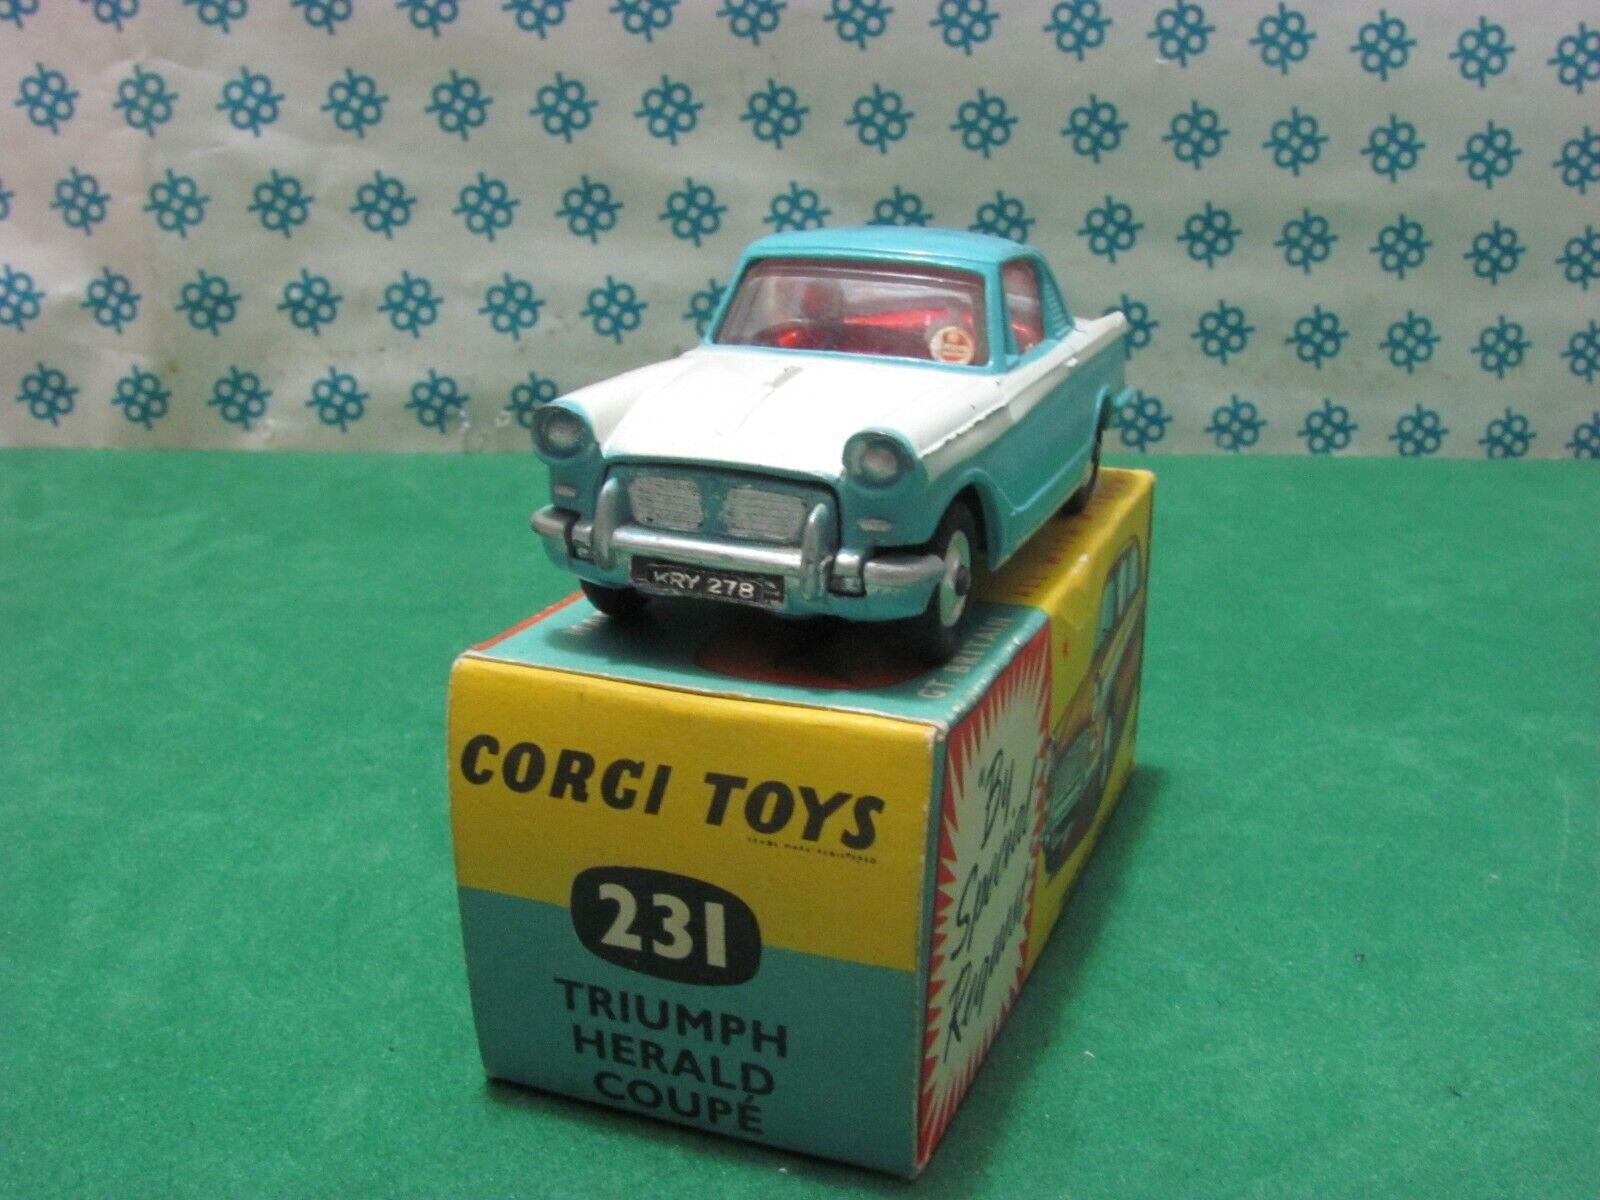 Vintage - TRIUMPH HERALD coup 65533;rough 65533;- Corgi Toys 231 - MIB